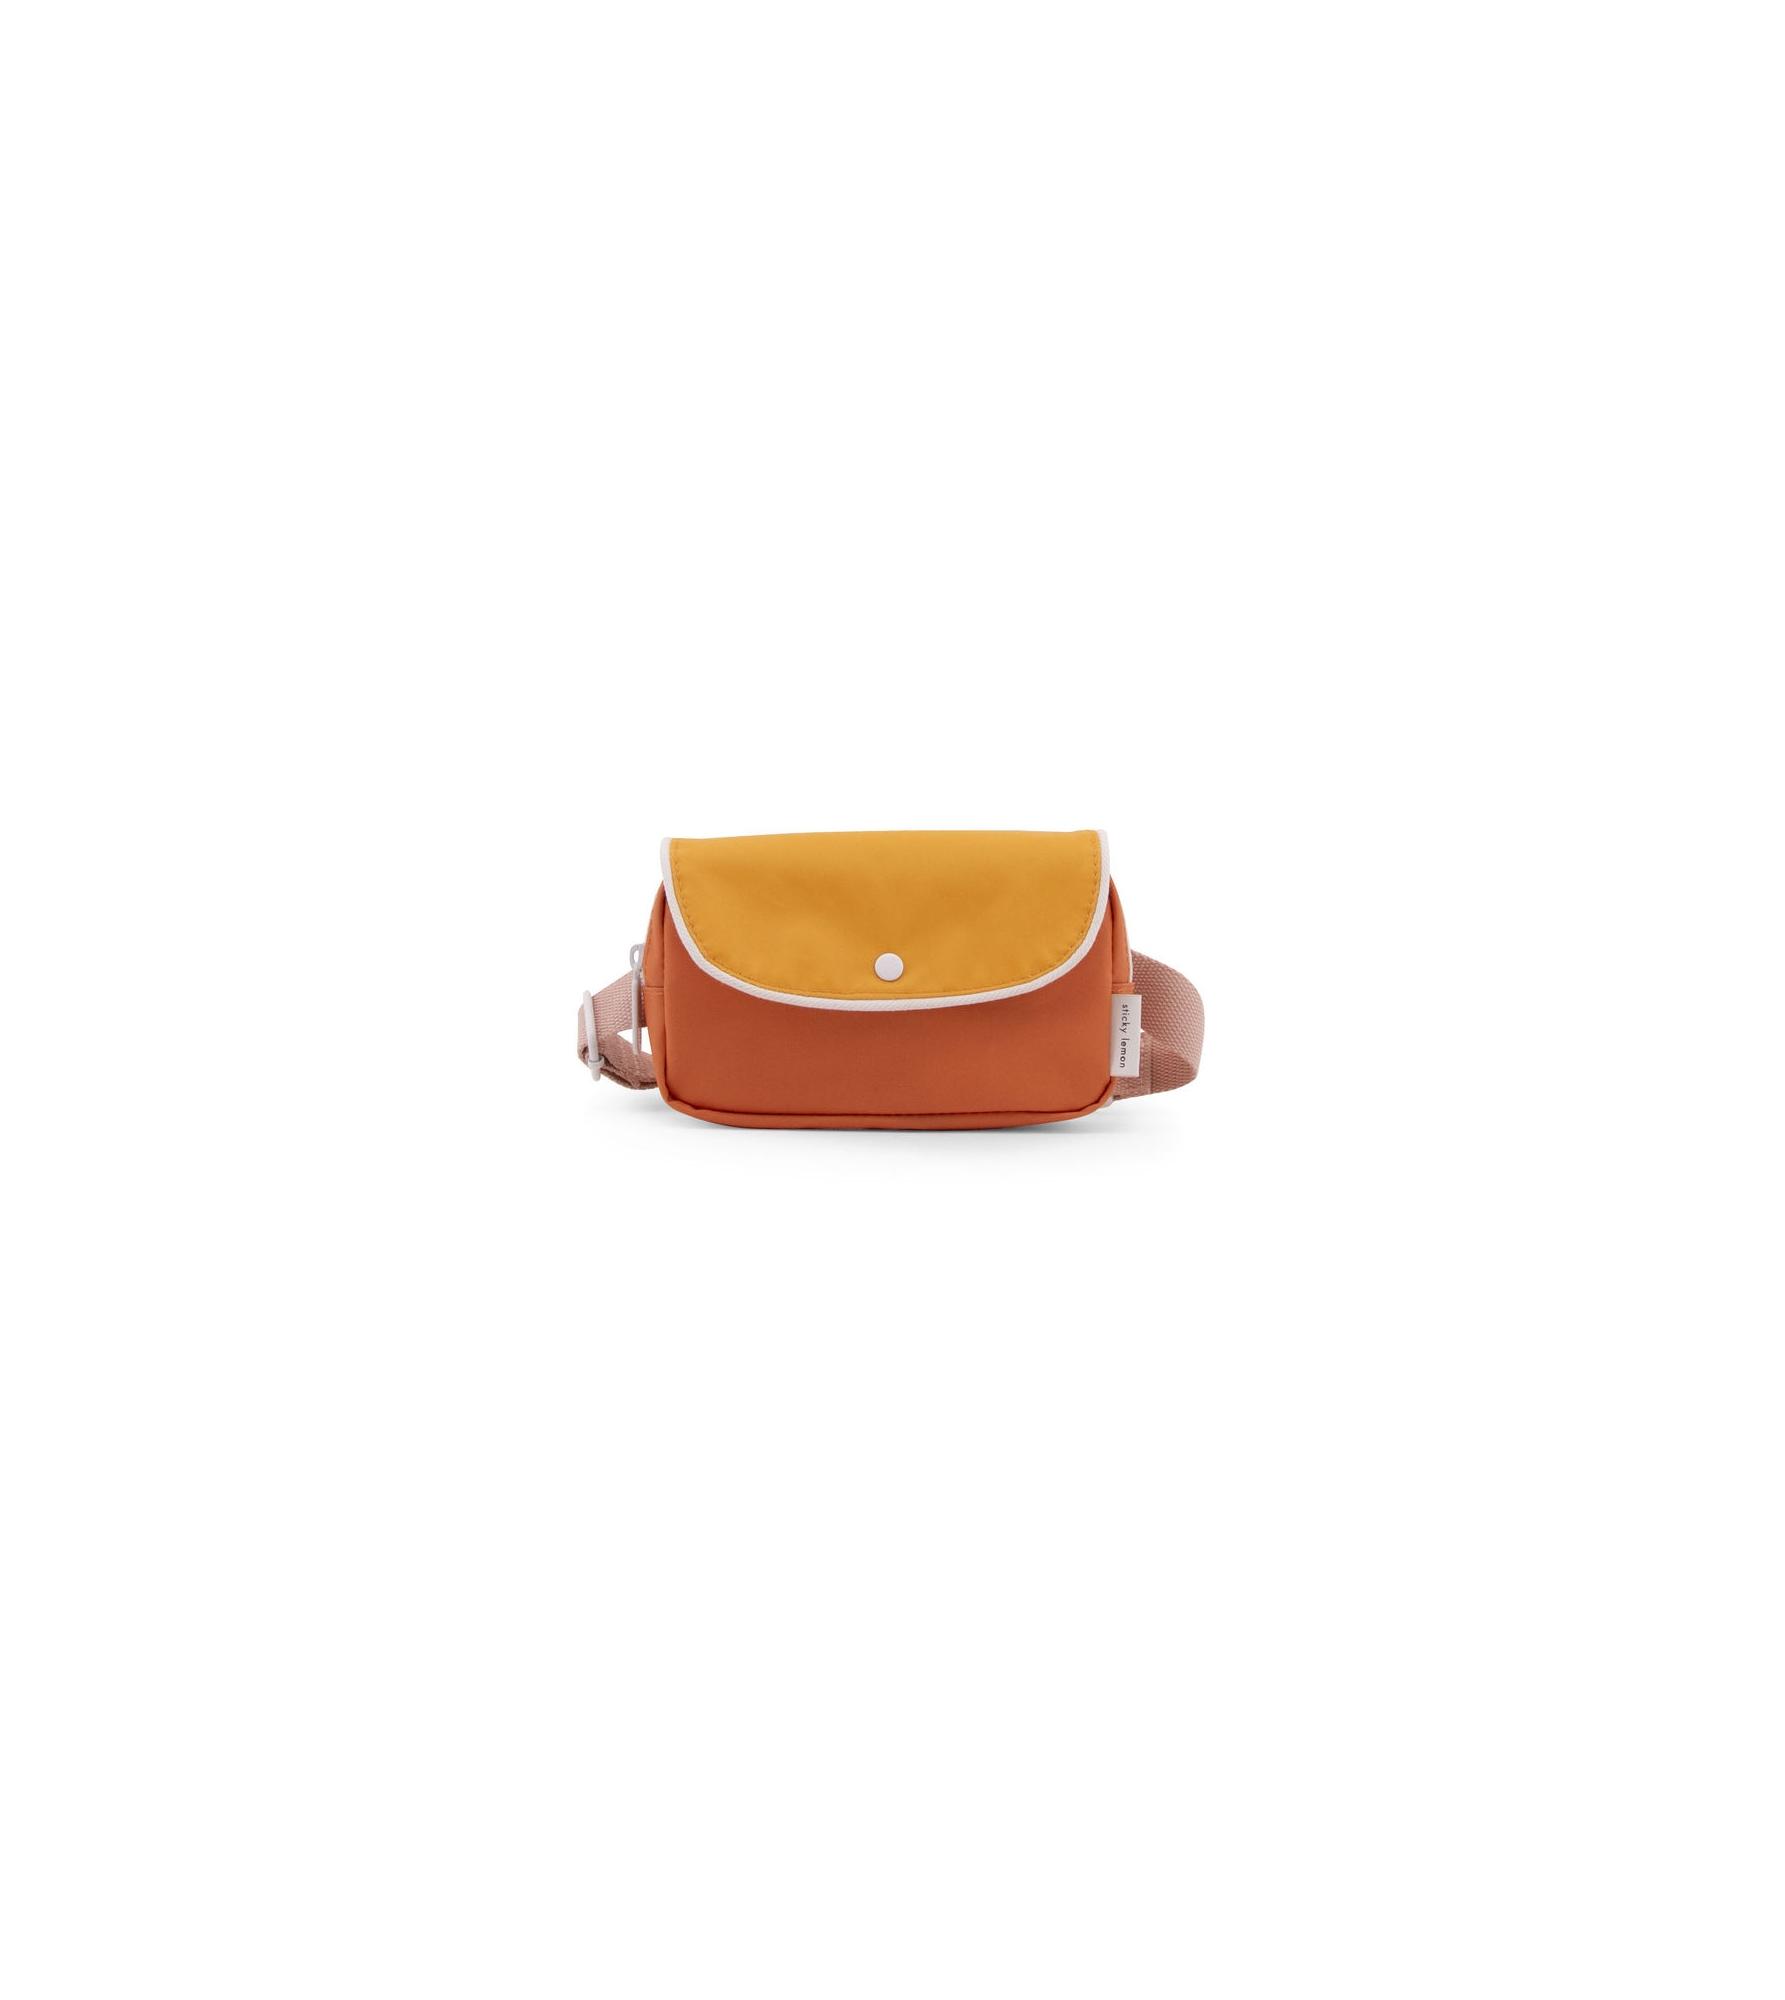 1801667_–__Sticky_Lemon_-_wanderer_-_fanny_pack_-_carrot_orange_+_sunny_yellow_+_candy_pink.jpg